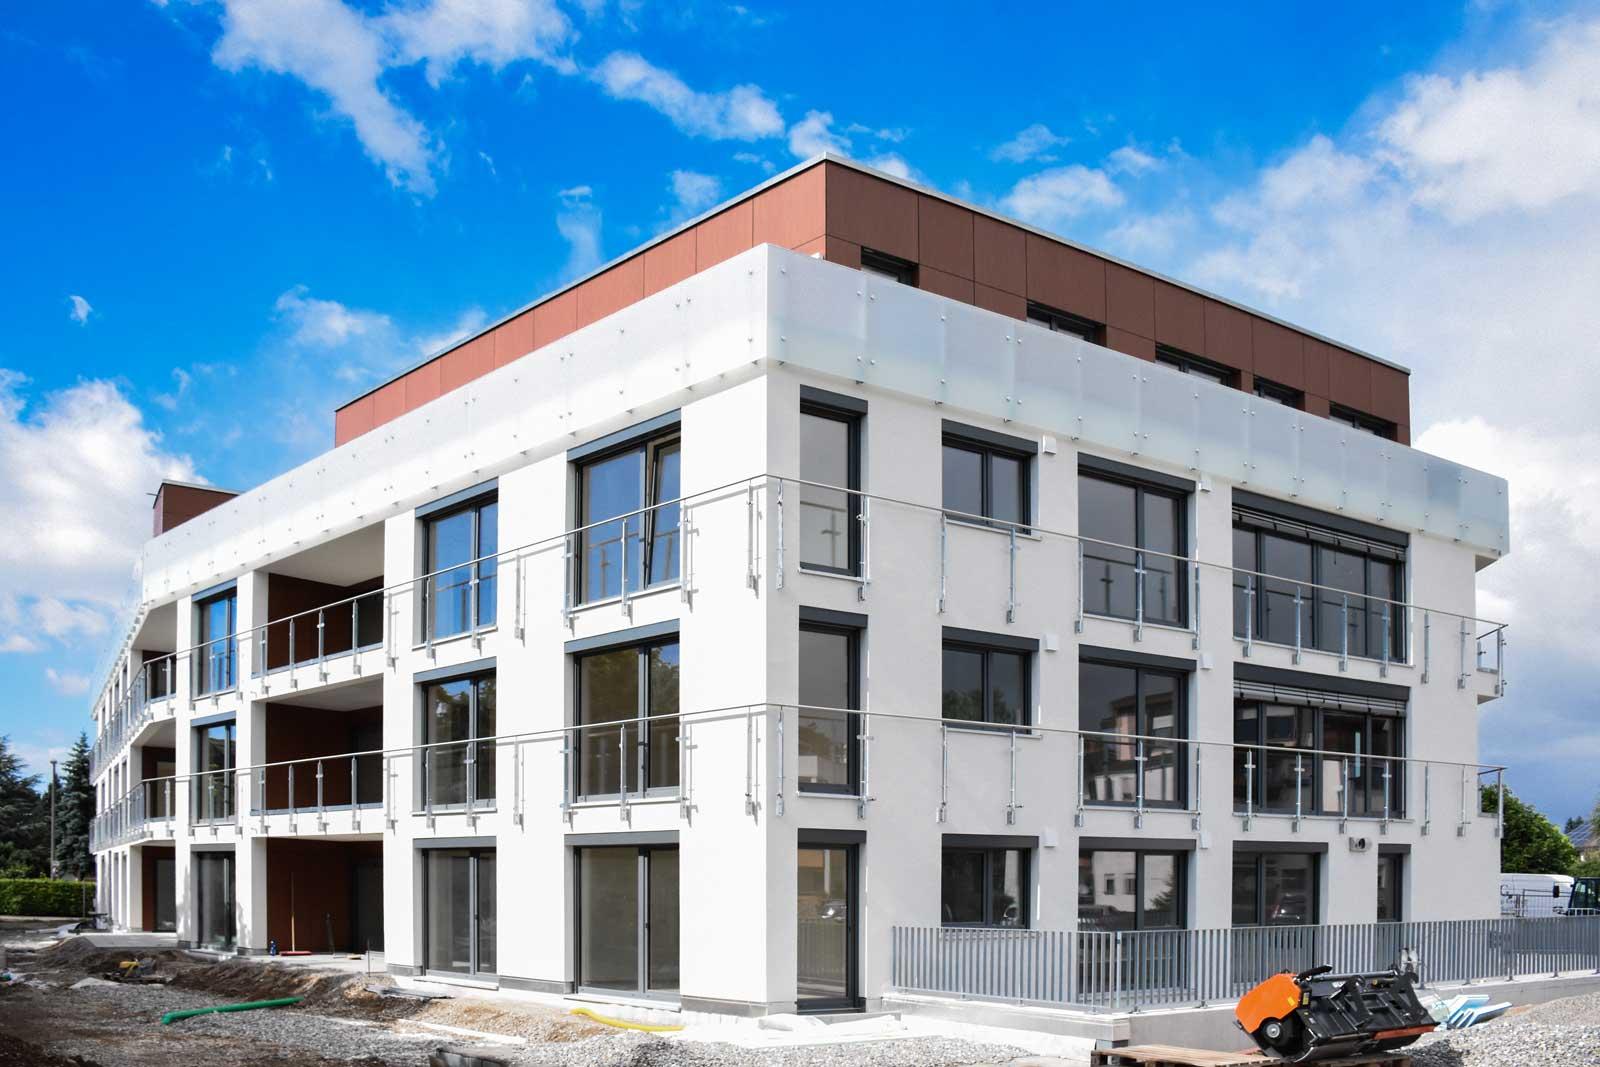 Neubau mehrfamilienhaus in efringen kirchen for Mehrfamilienhaus neubau